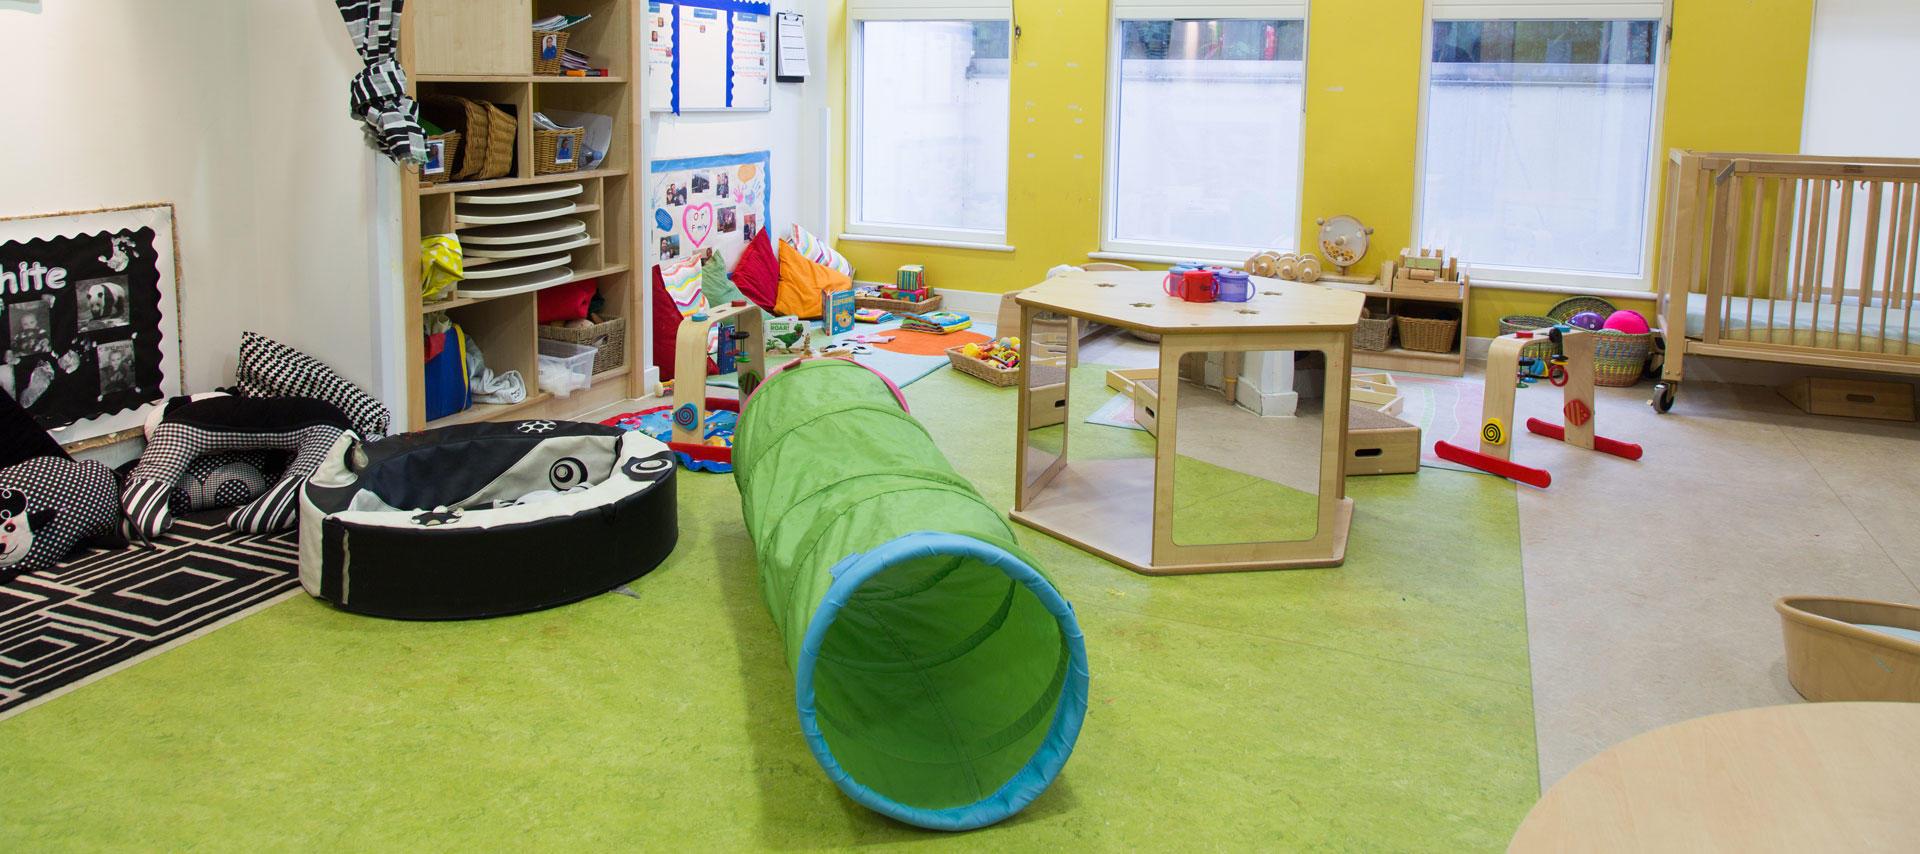 Bright Horizons Northcote Road Day Nursery and Preschool London 03339 208348